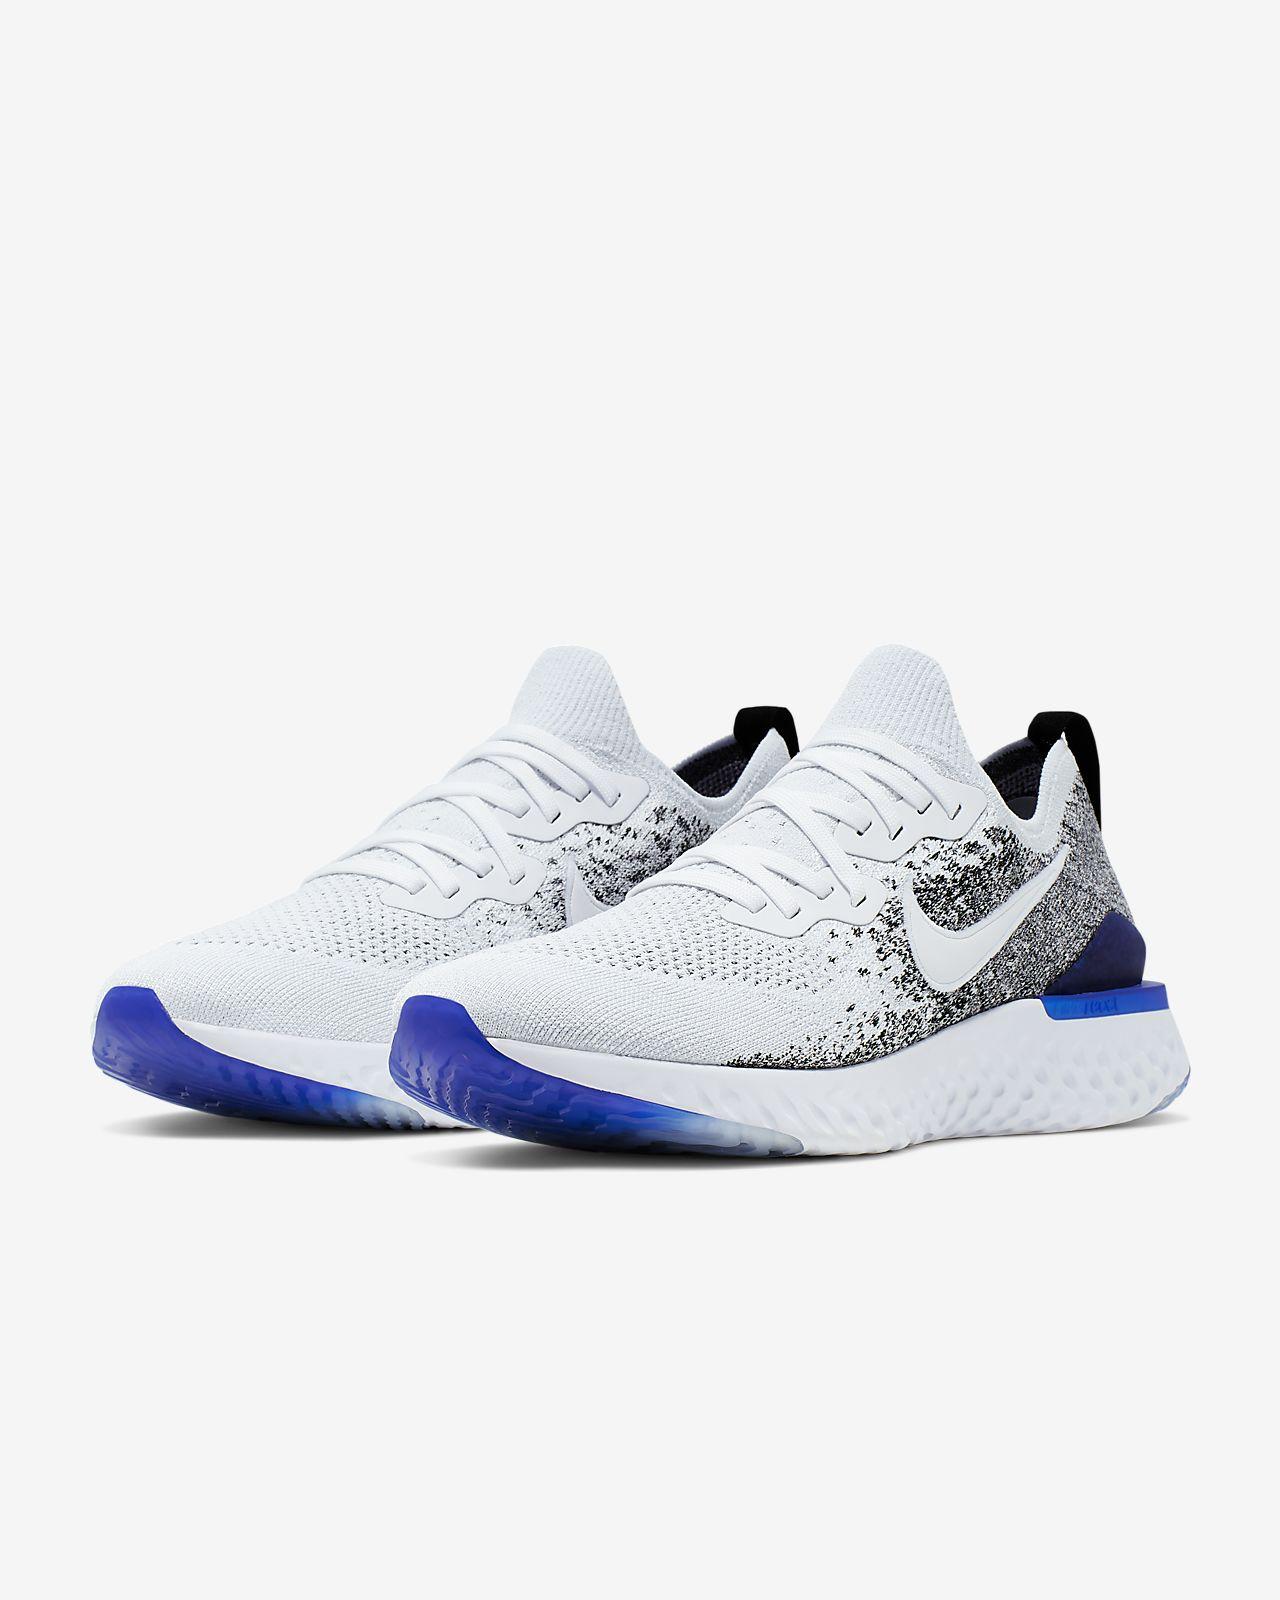 official photos 0e838 85864 Nike Epic React Flyknit 2 Men's Running Shoe